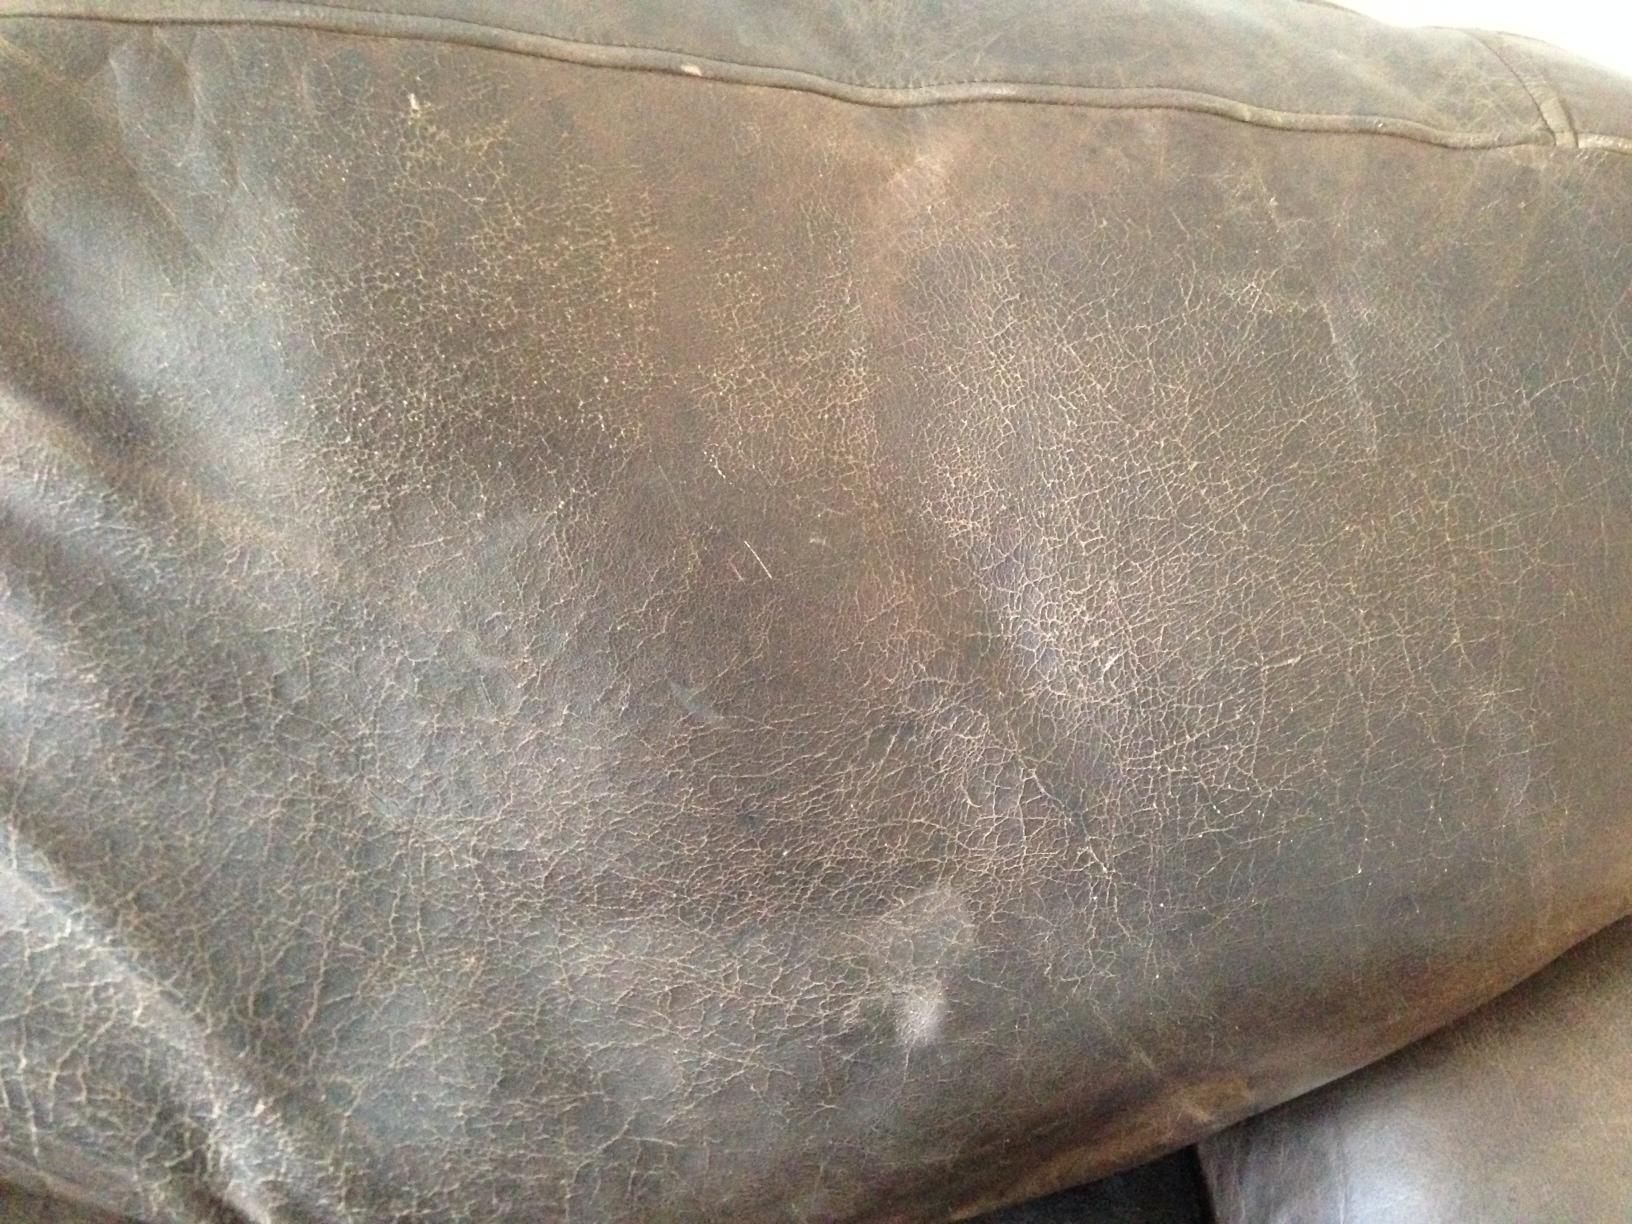 Aniline Wax Pull Up Leather Sofa Body Oils Heavy Smoke